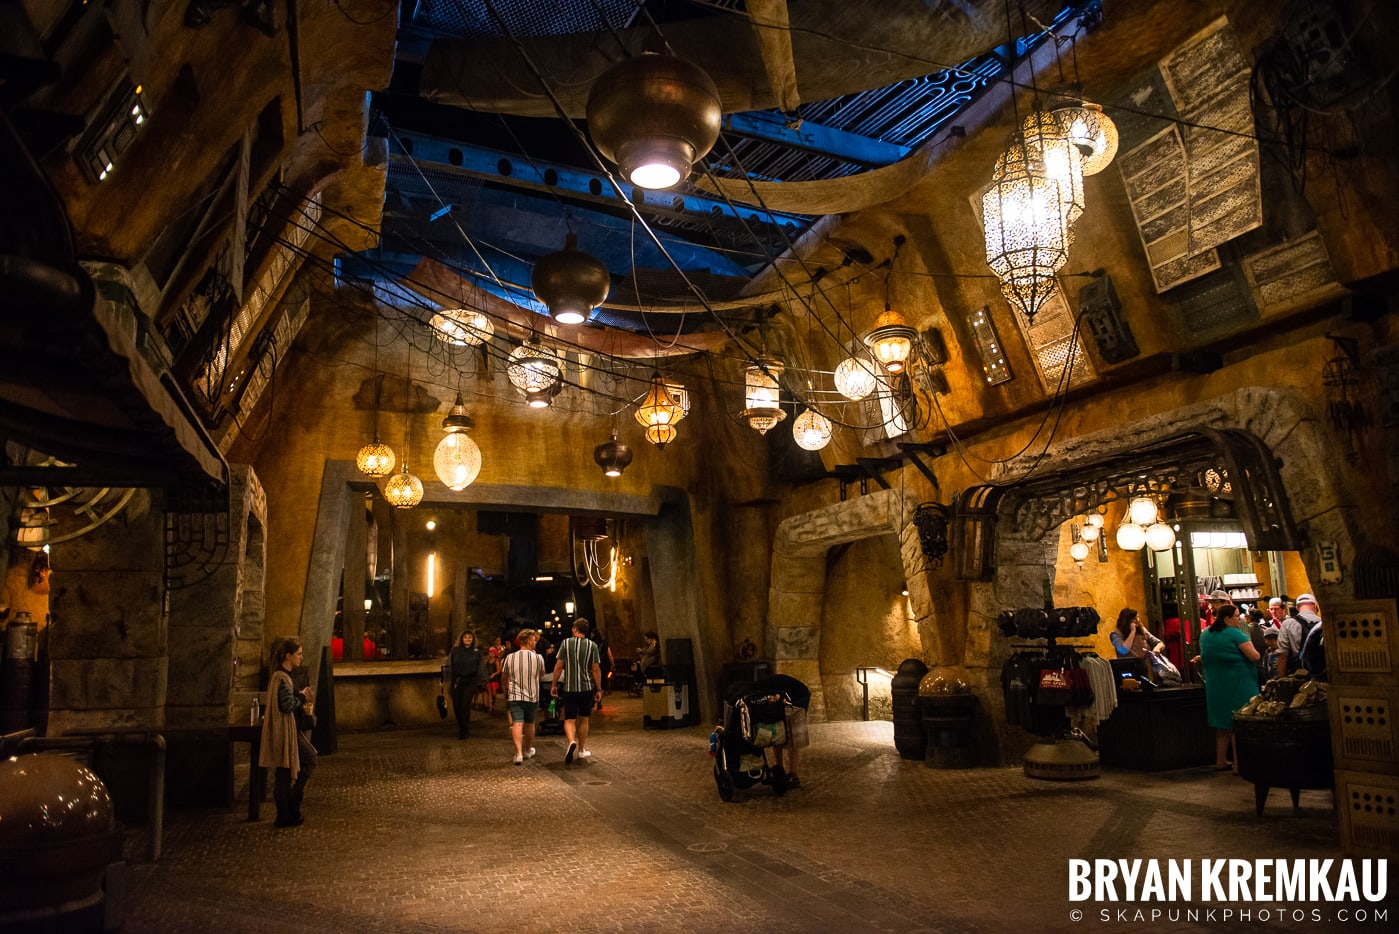 Walt Disney World Vacation: Day 5 (Animal Kingdom / Disney's Hollywood Studios) - 10.3.19 (33)